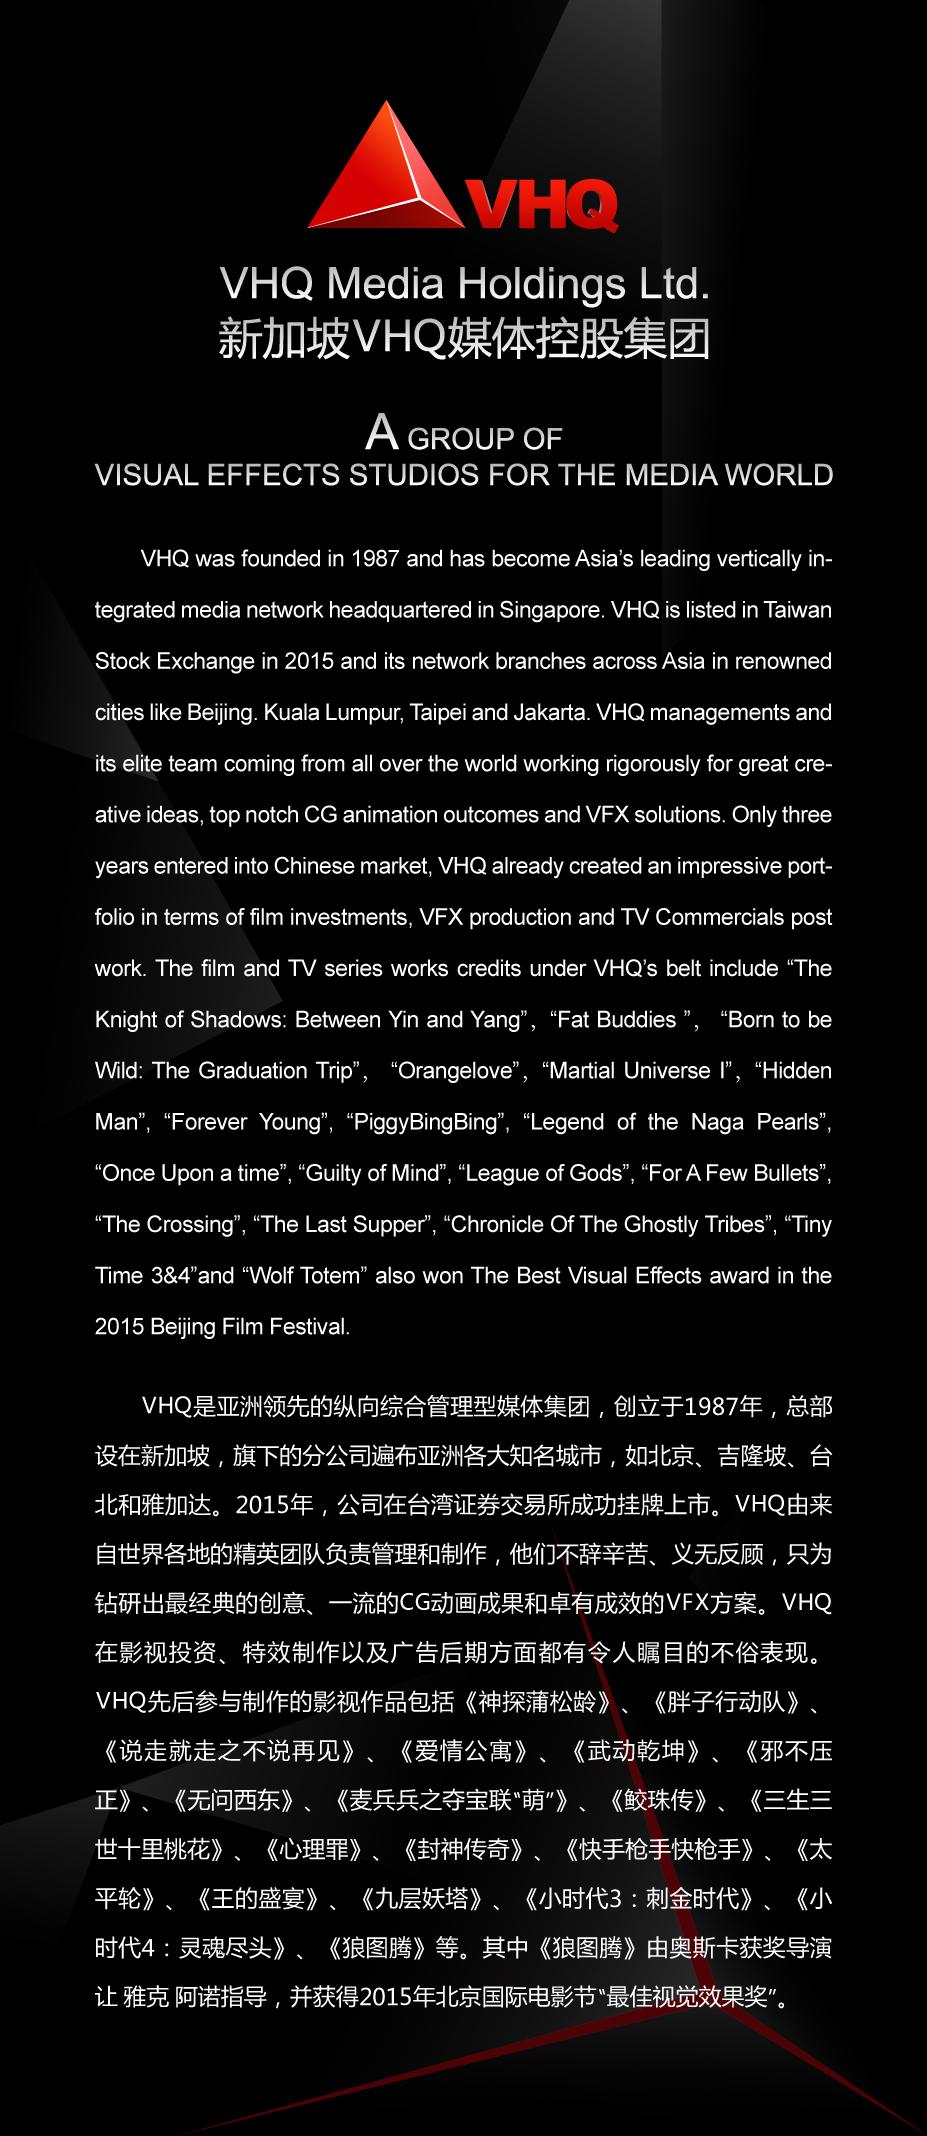 VHQ快讯:2019中国广告影片金狮奖,VHQ斩获一银一铜两项奖项